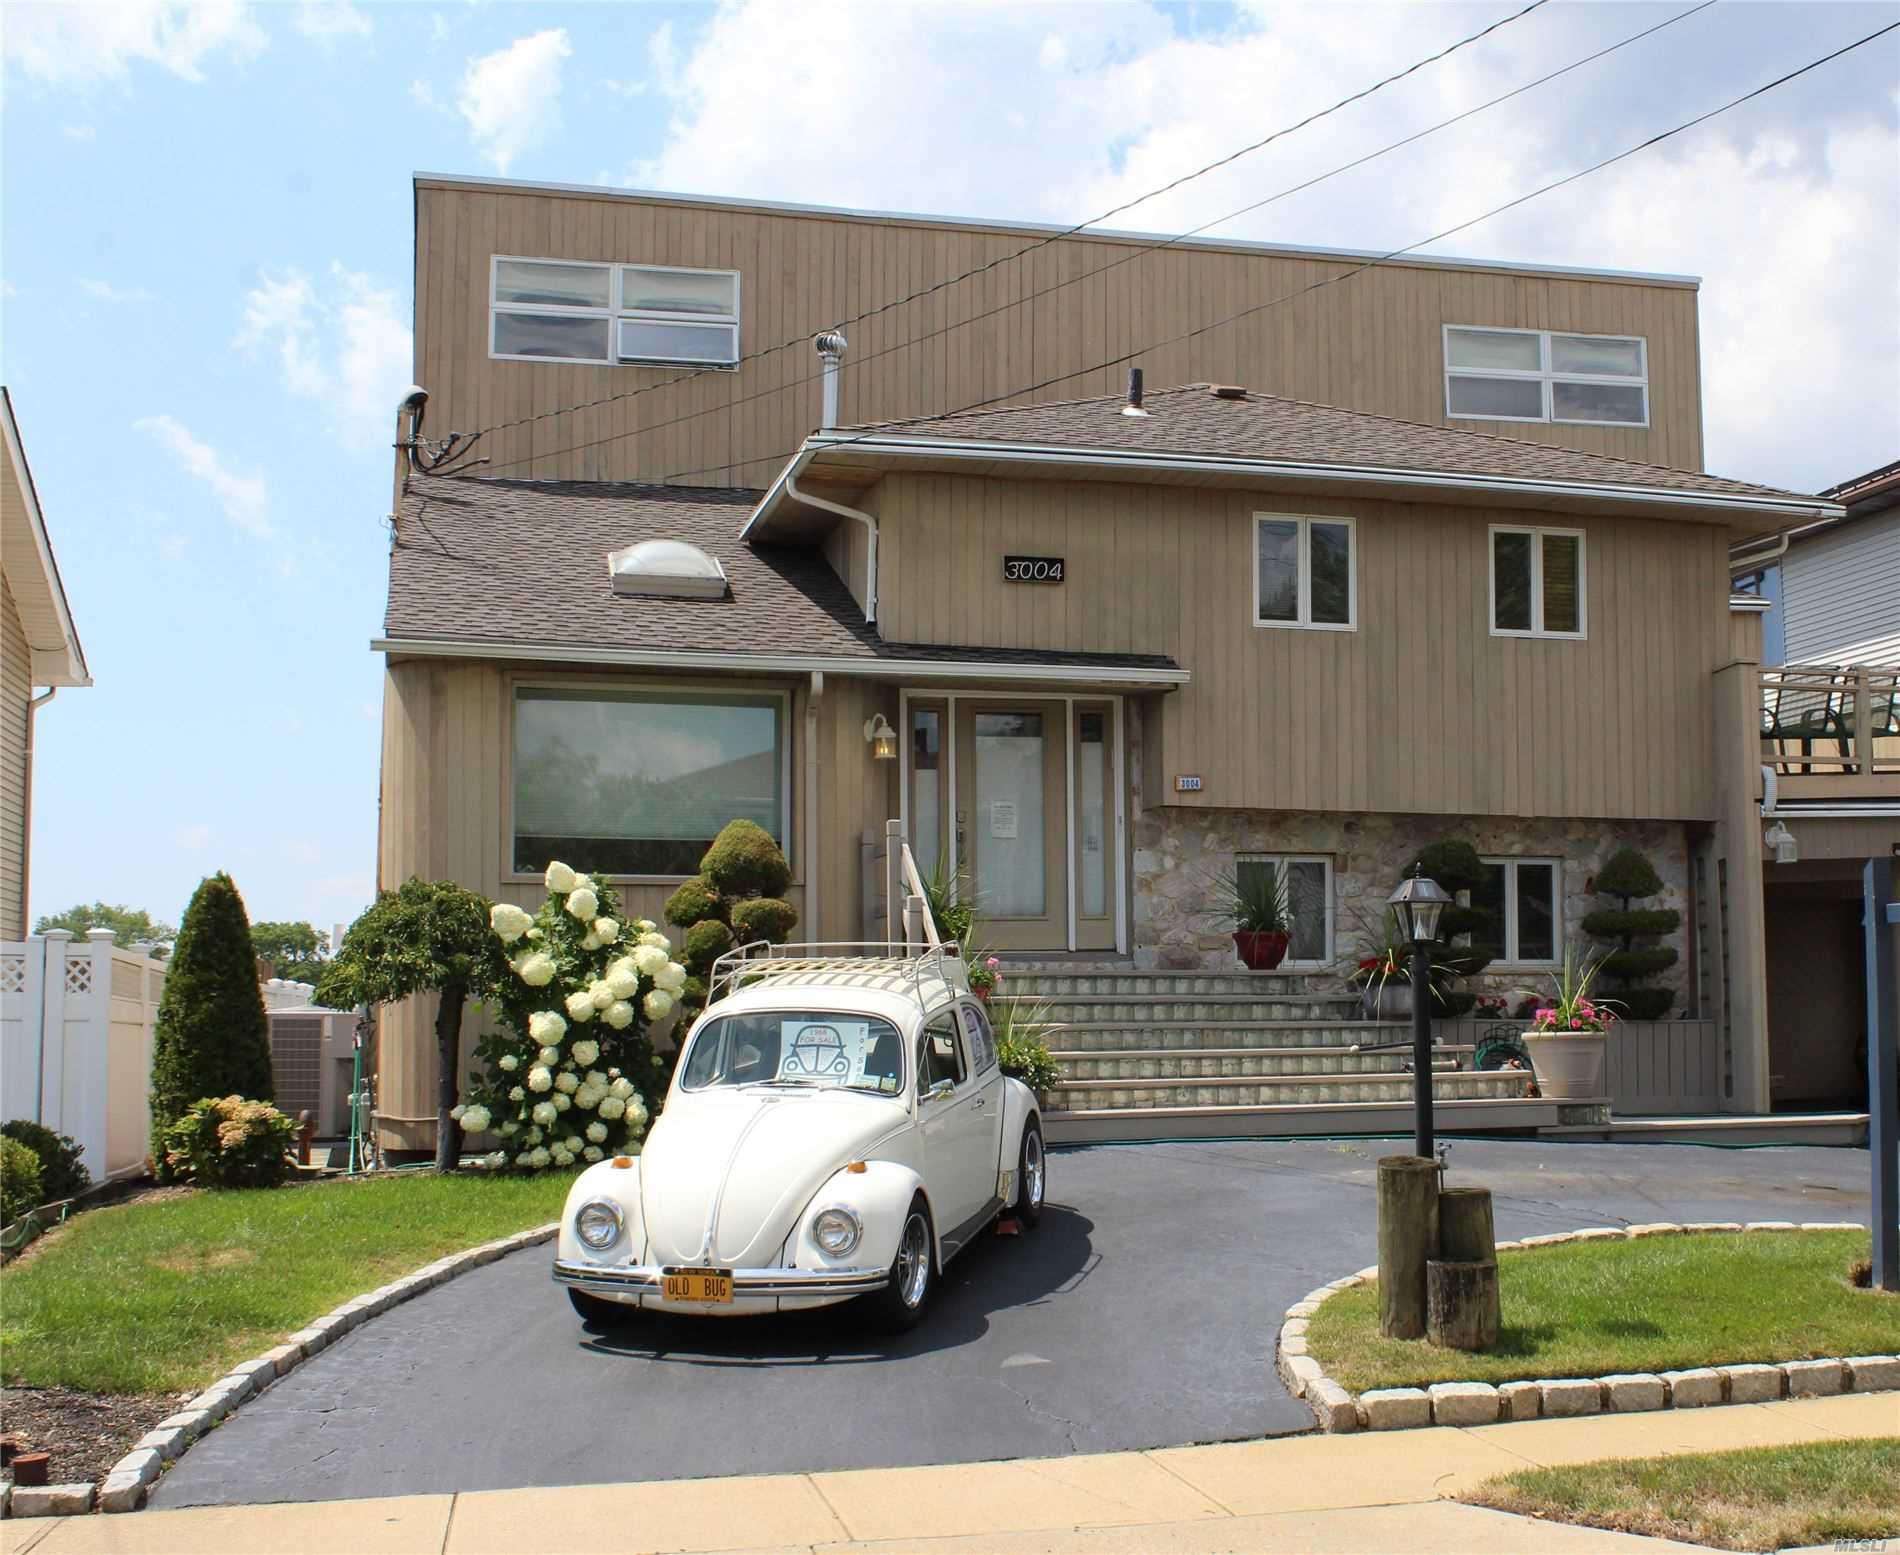 3004 Shore Rd - Bellmore, New York